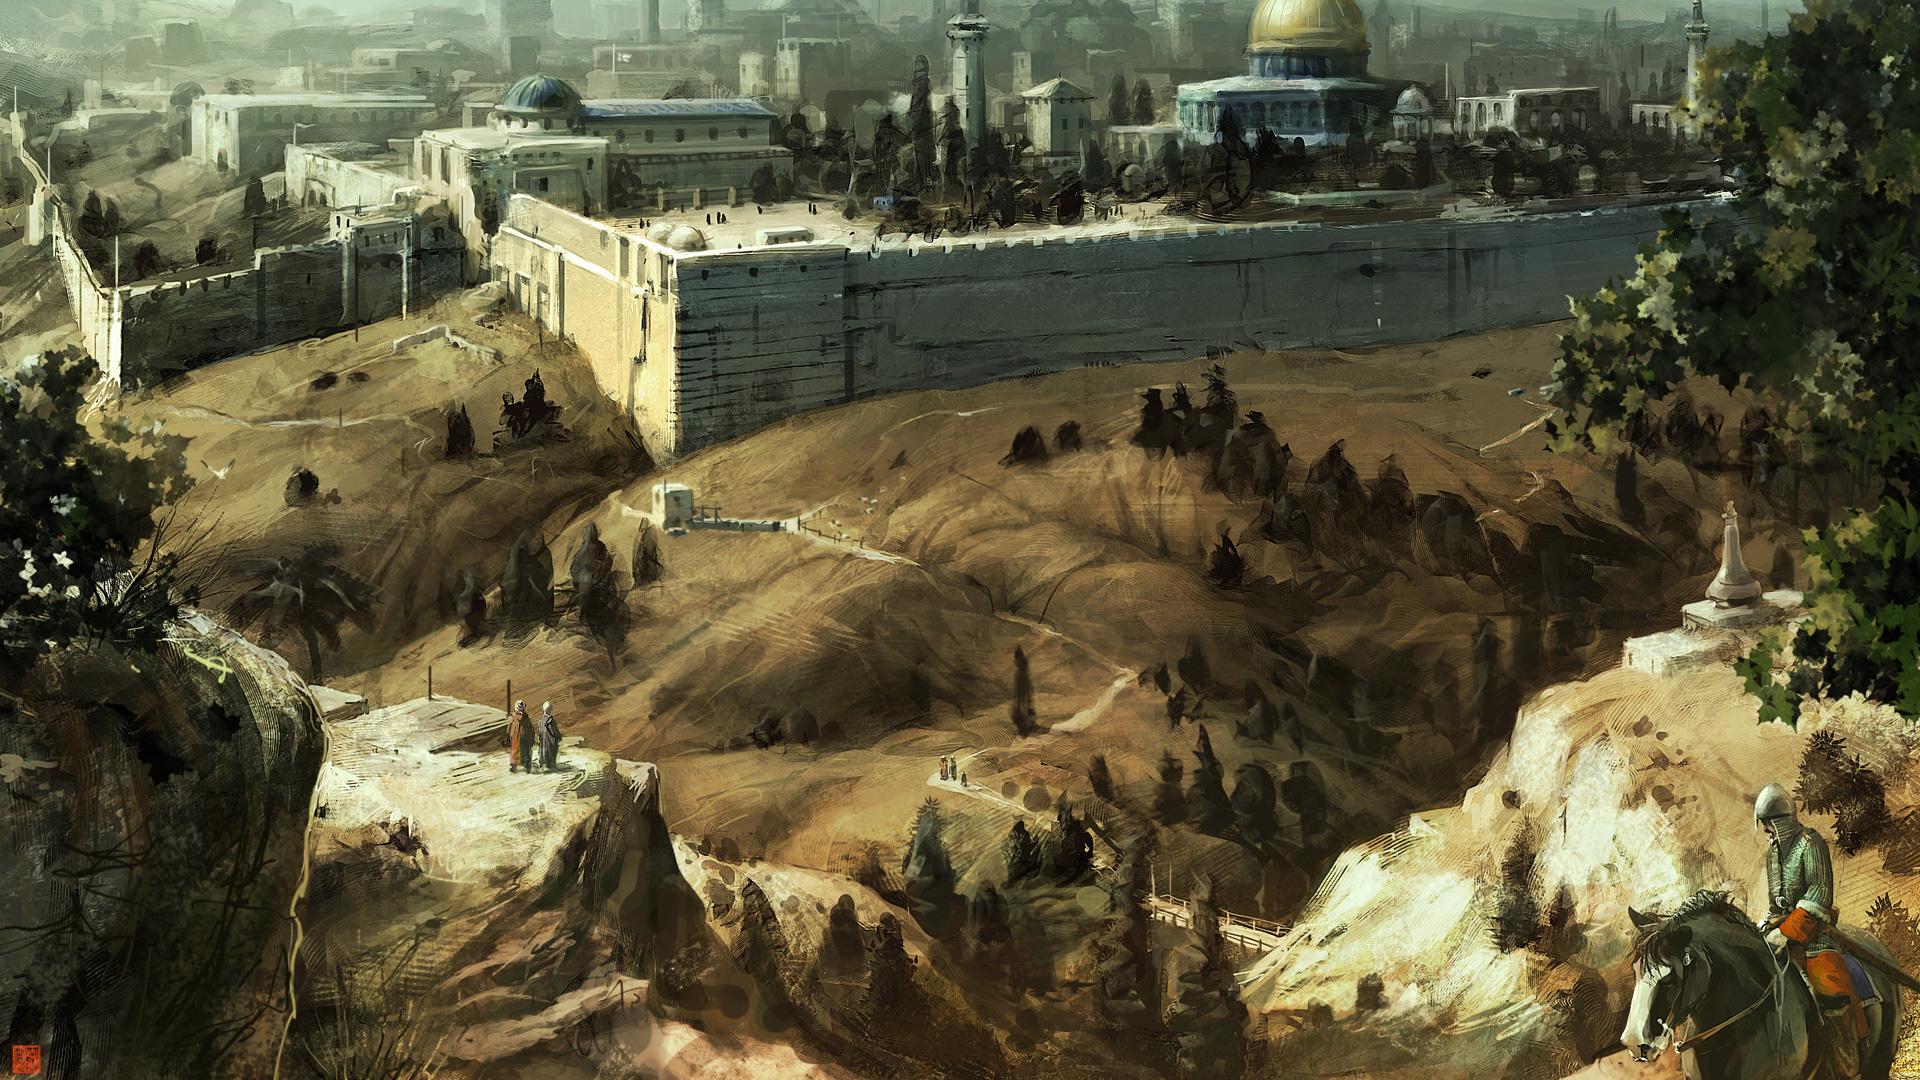 Assassins Creed wallpaper 17